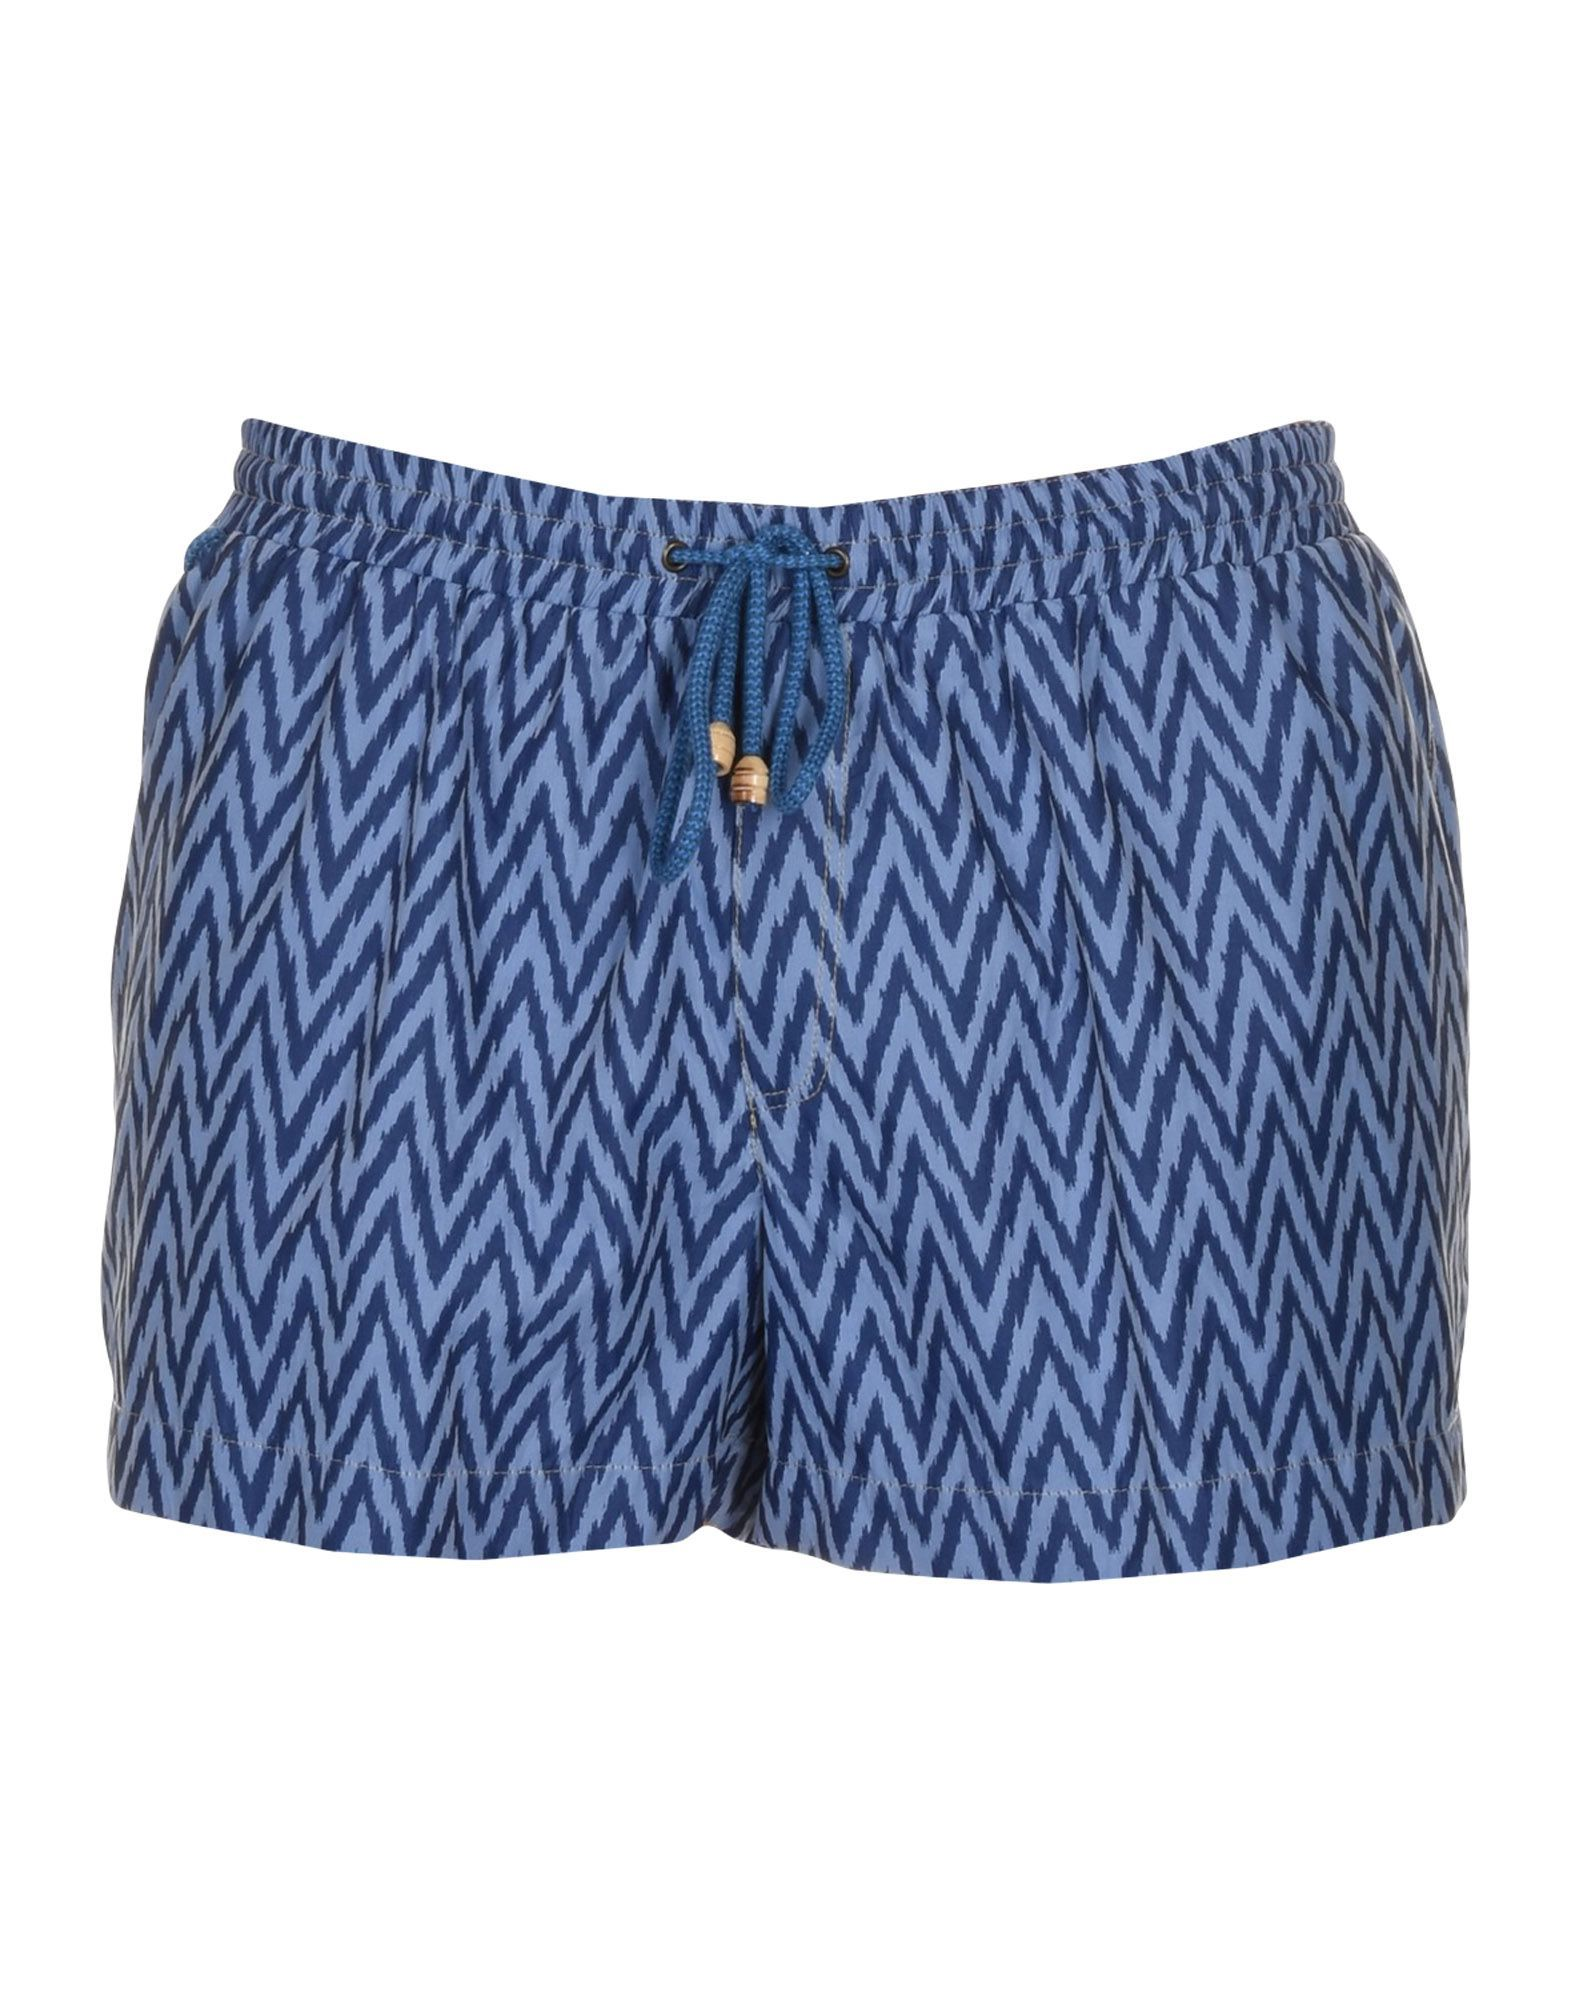 409274a19a701 MISSONI . #missoni #cloth #   Missoni Men   Swim trunks, Swim shorts ...